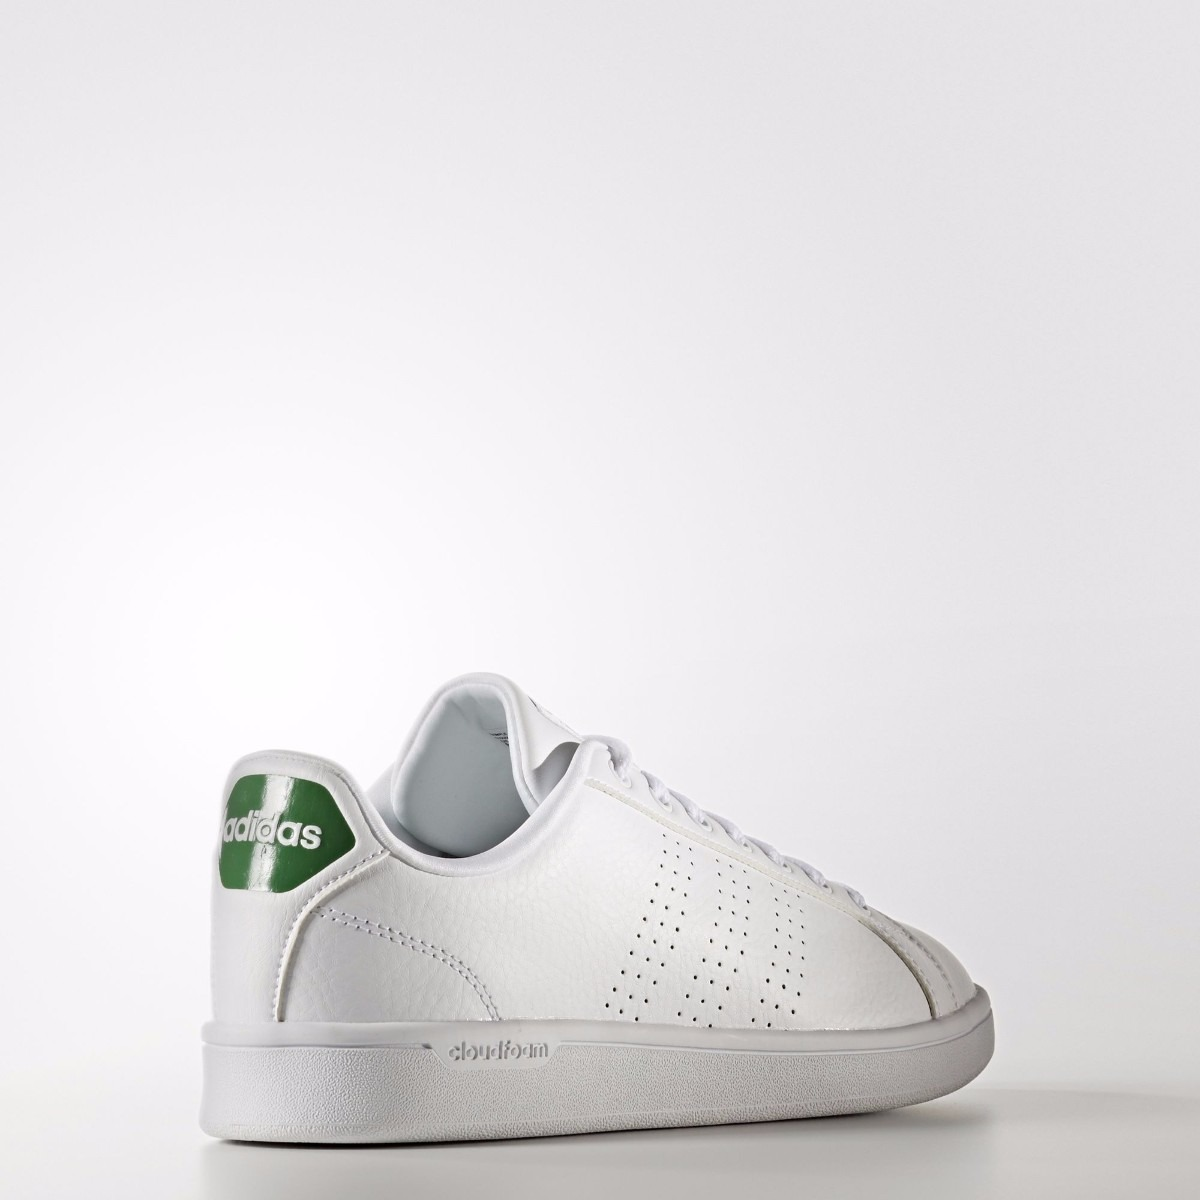 ea3eac4e59e81 Tenis adidas Cloudfoam Advantage Clean Aw3914 -   235.000 en Mercado ...